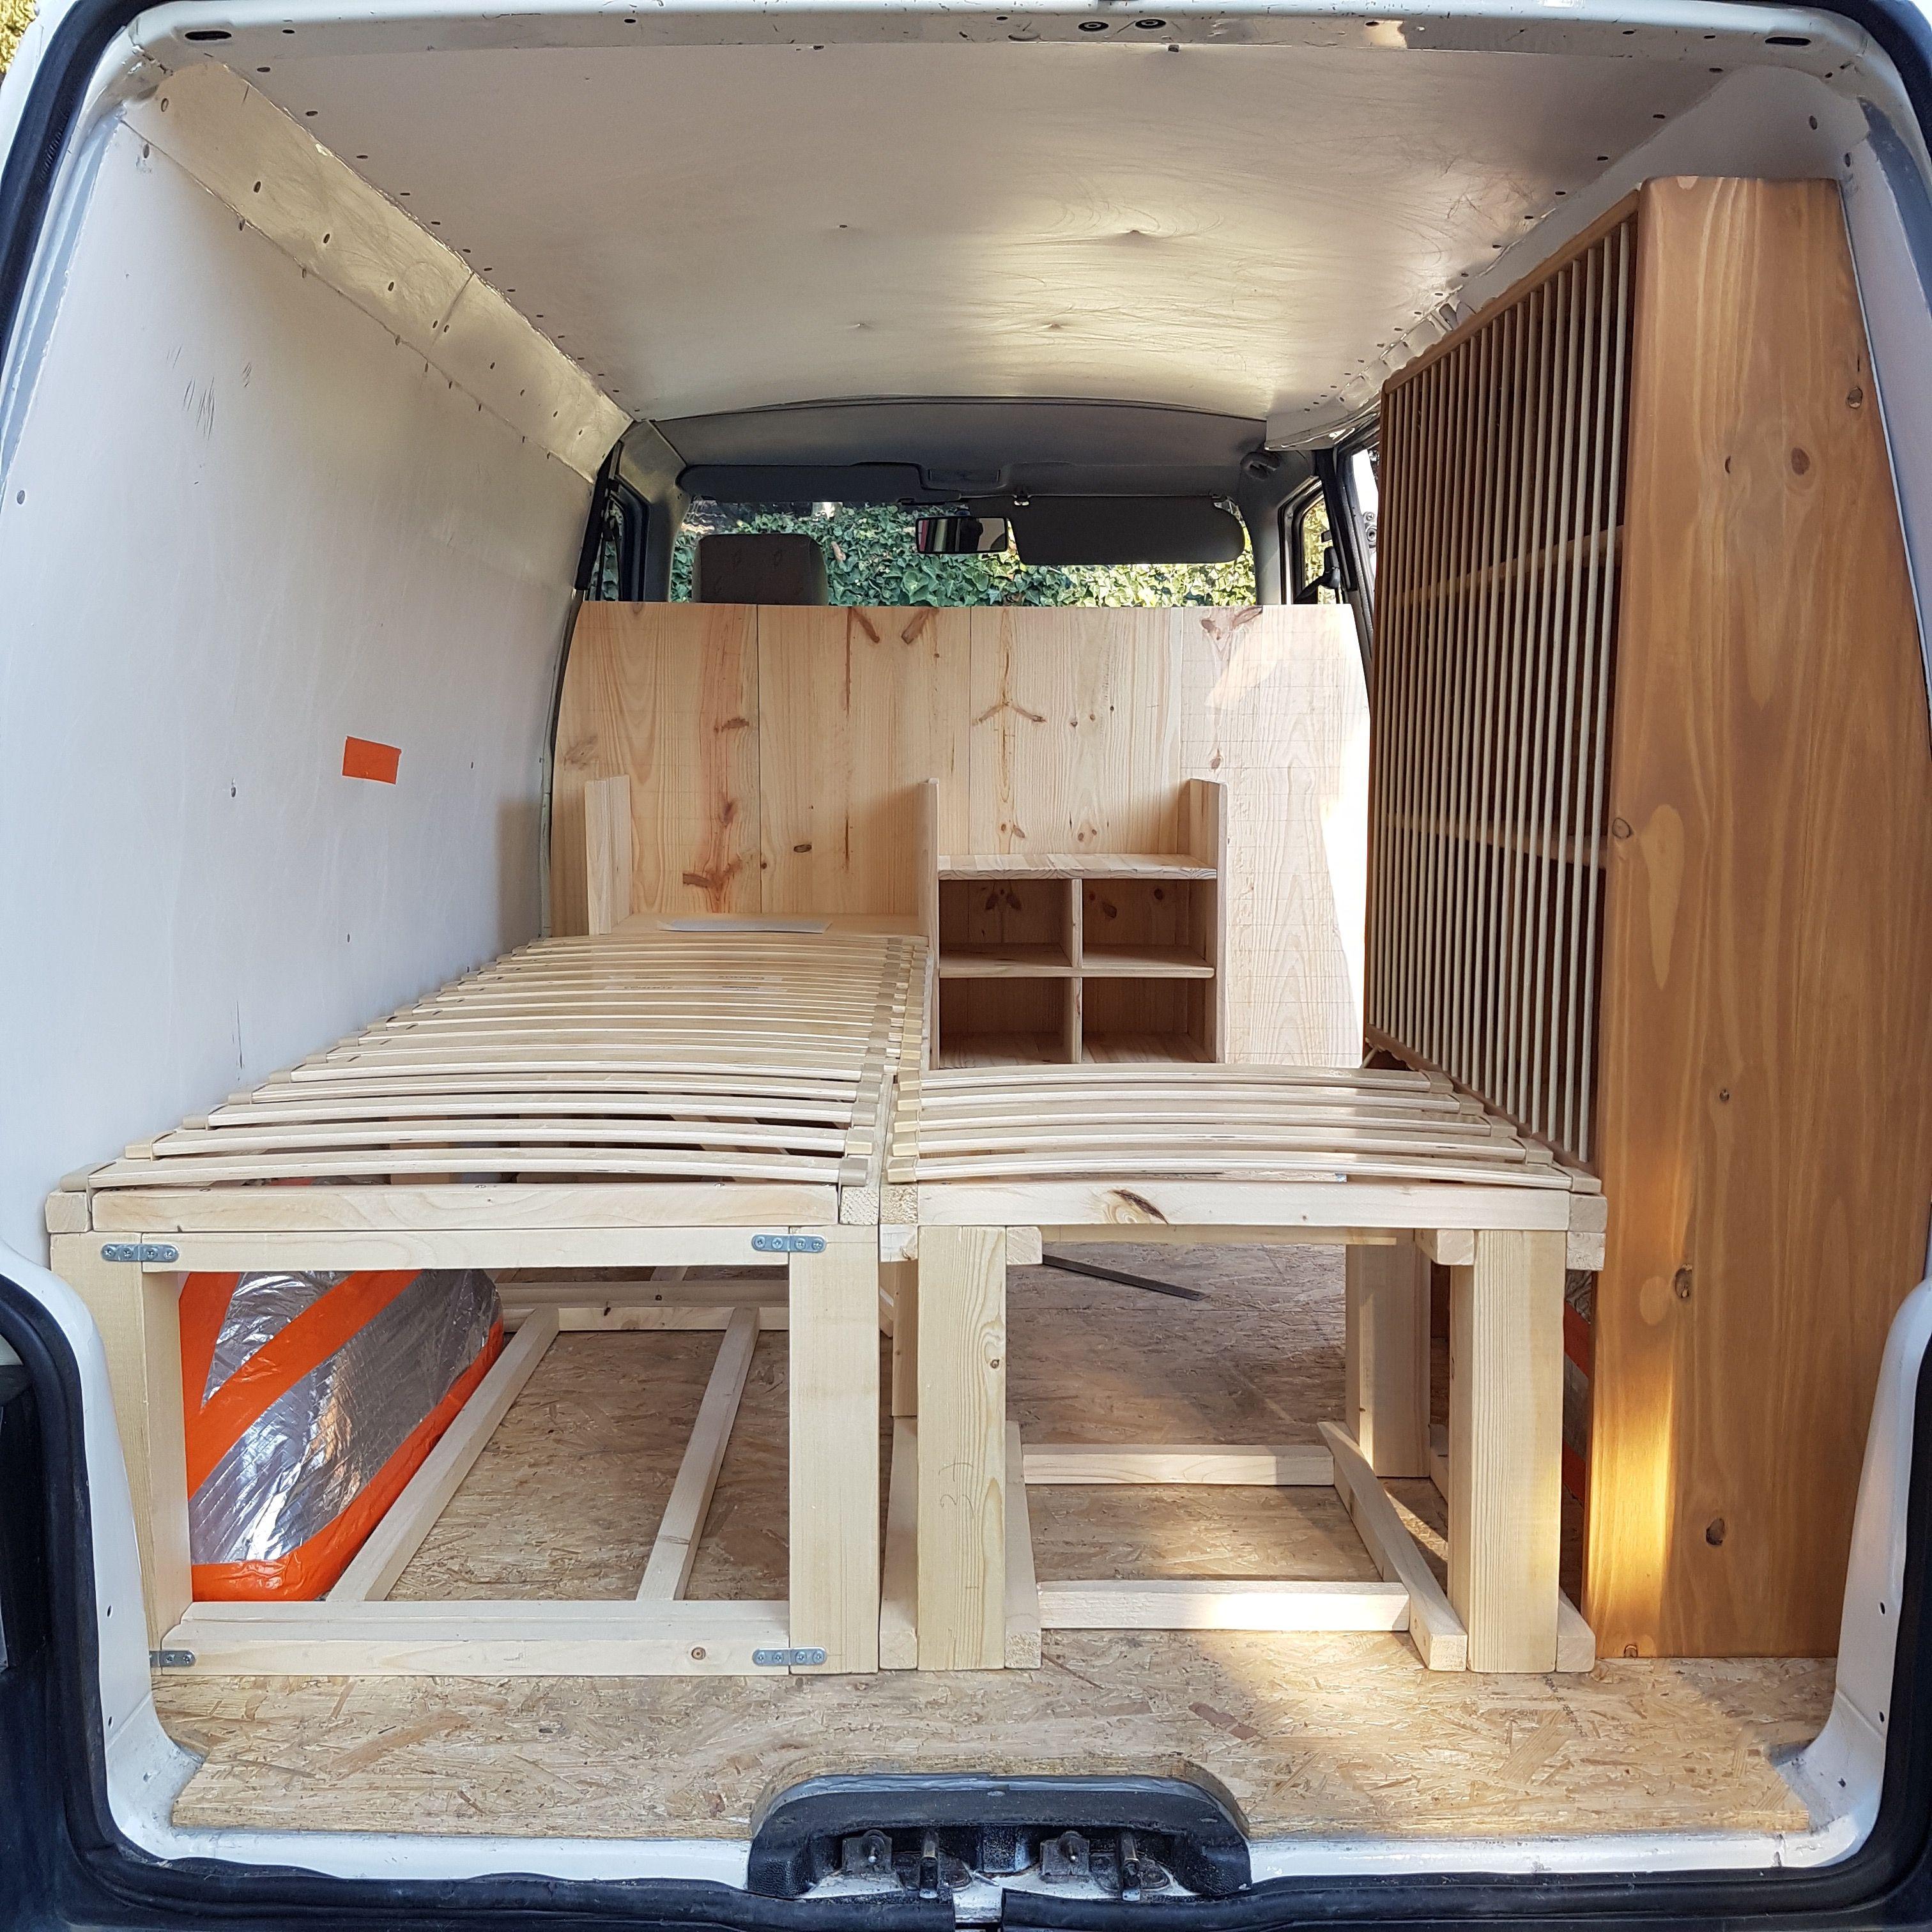 Instagram Radiusand Ulna Blog Www Radius Ulna Com Essentials Furnitures For A Diy Camper Amenagement Camionette Fourgon Amenage Camping Car Van Amenage